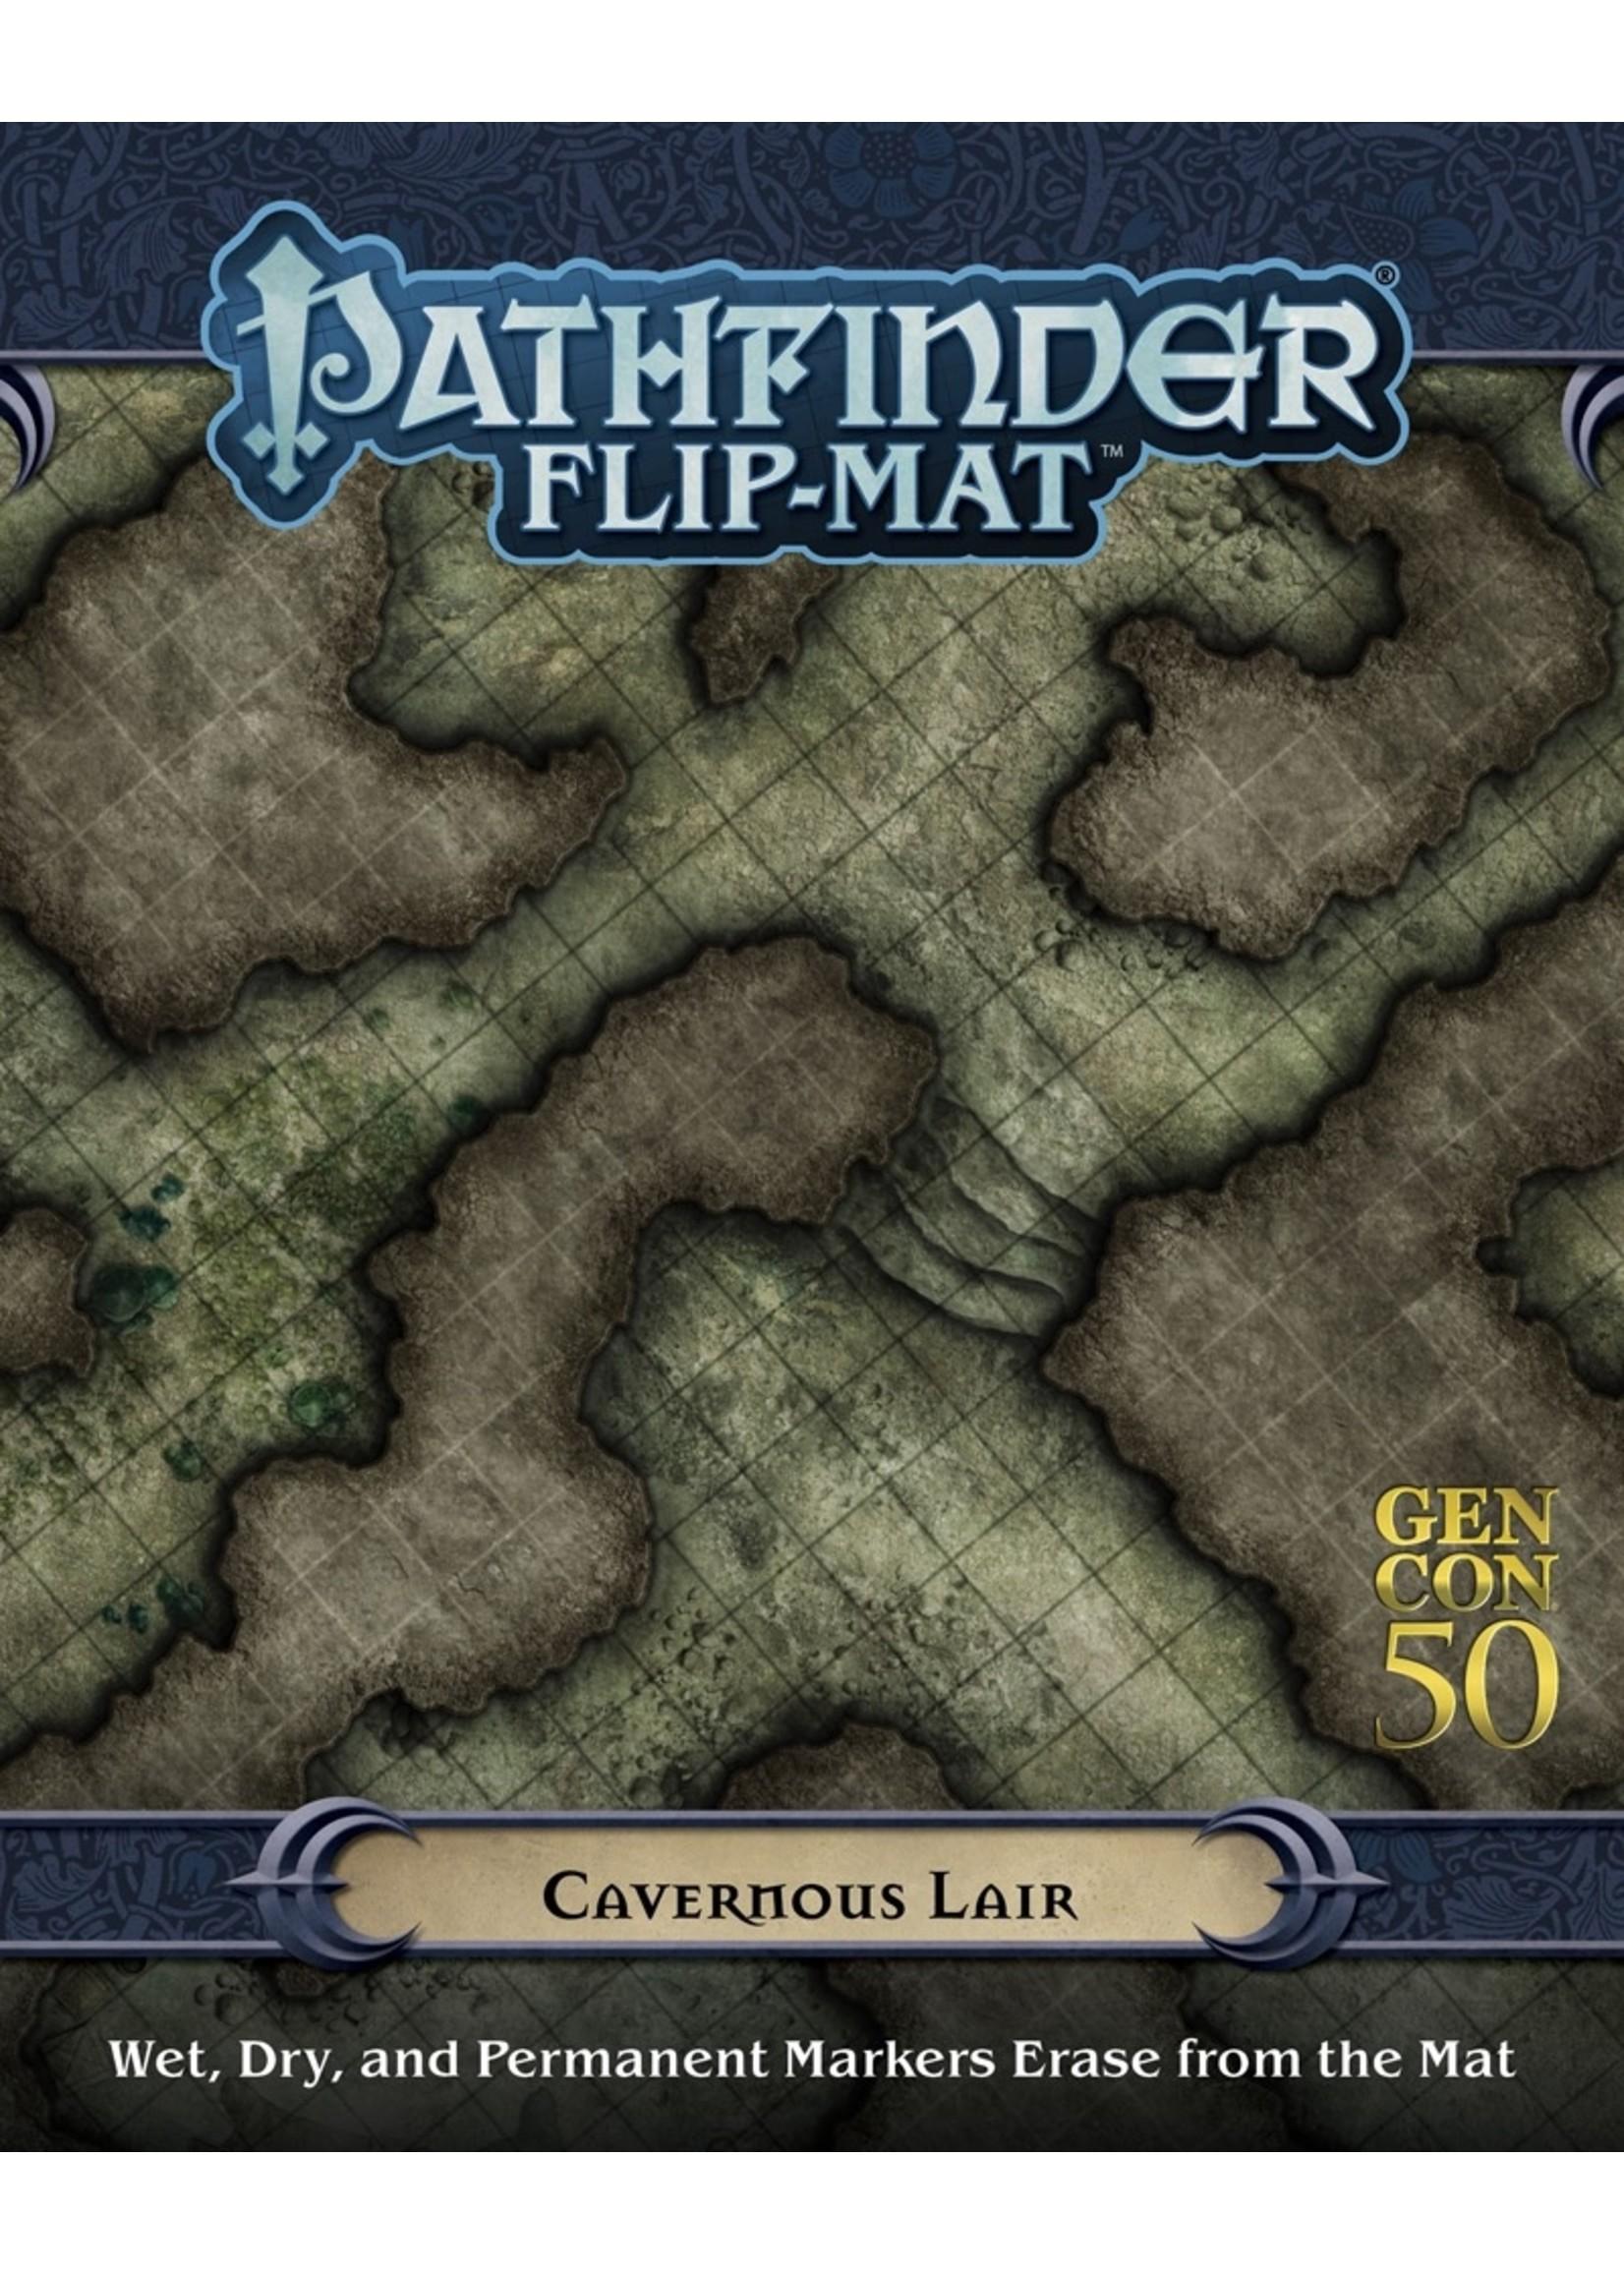 Pathfinder RPG: Flip-Mat - Cavernous Lair